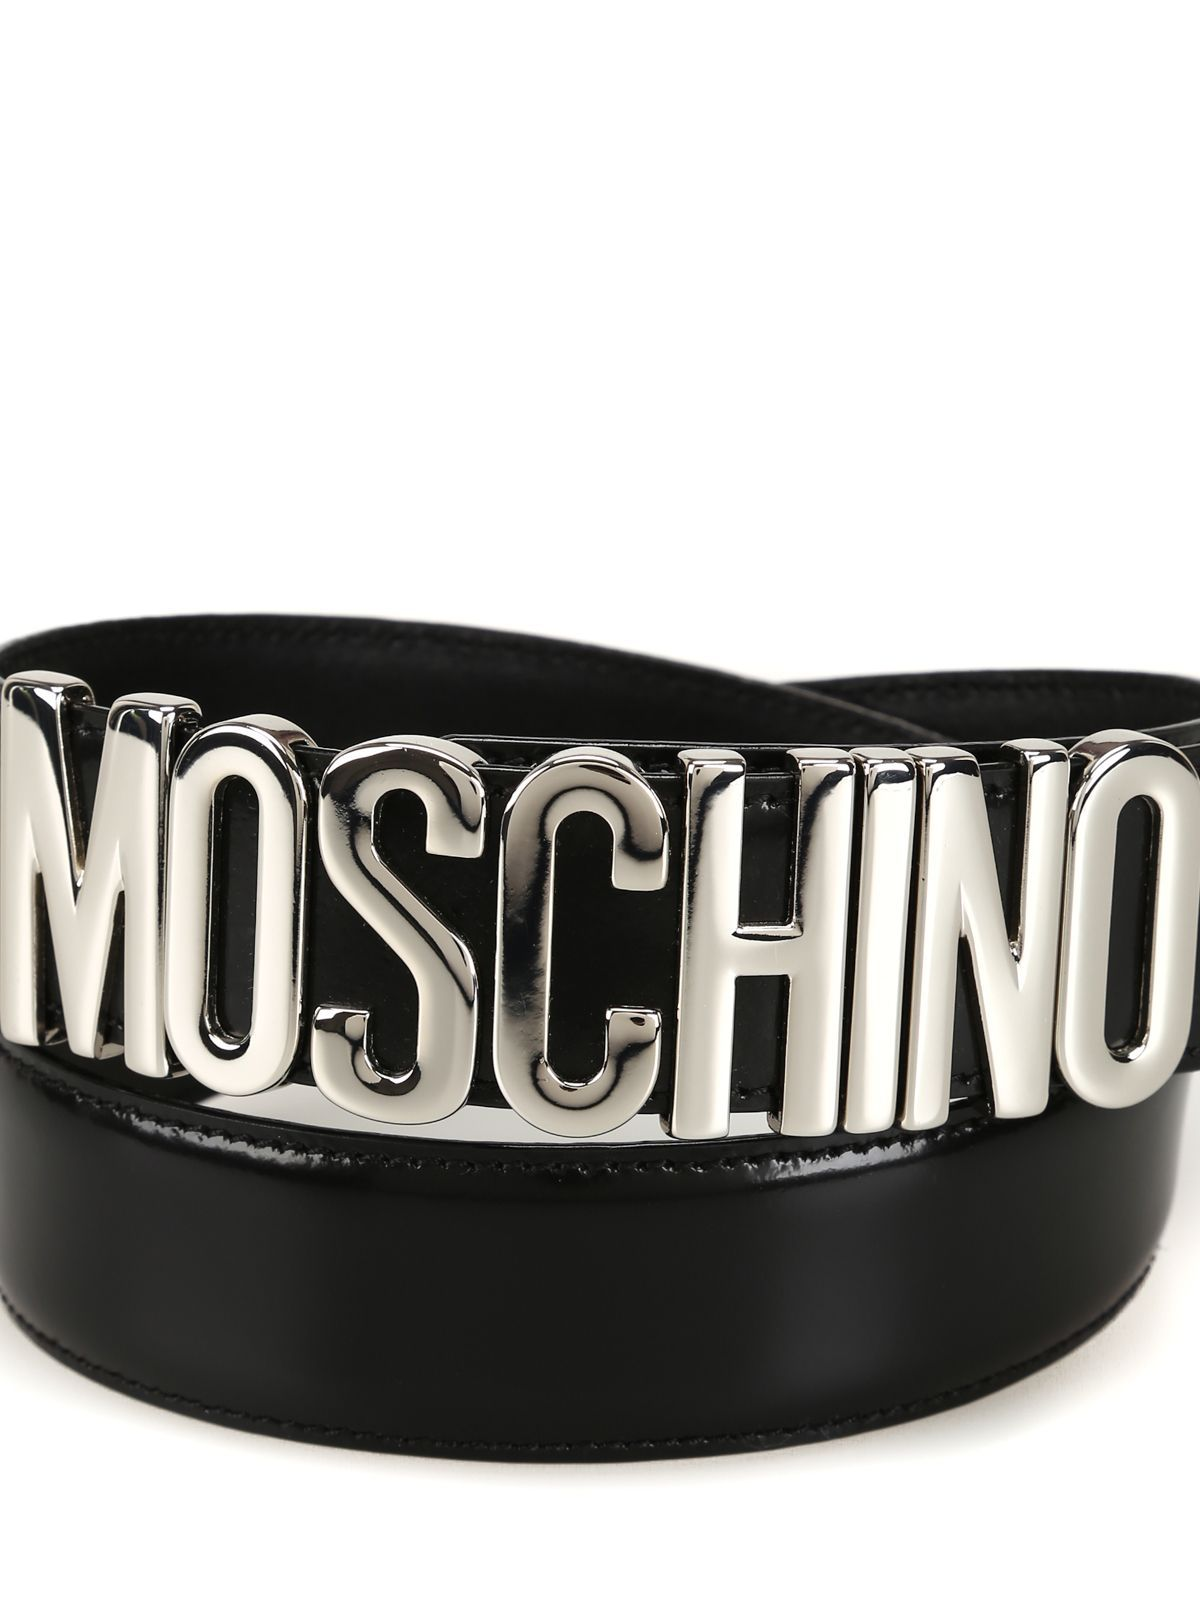 MOSCHINO WOMEN'S A801280071555 BLACK LEATHER BELT